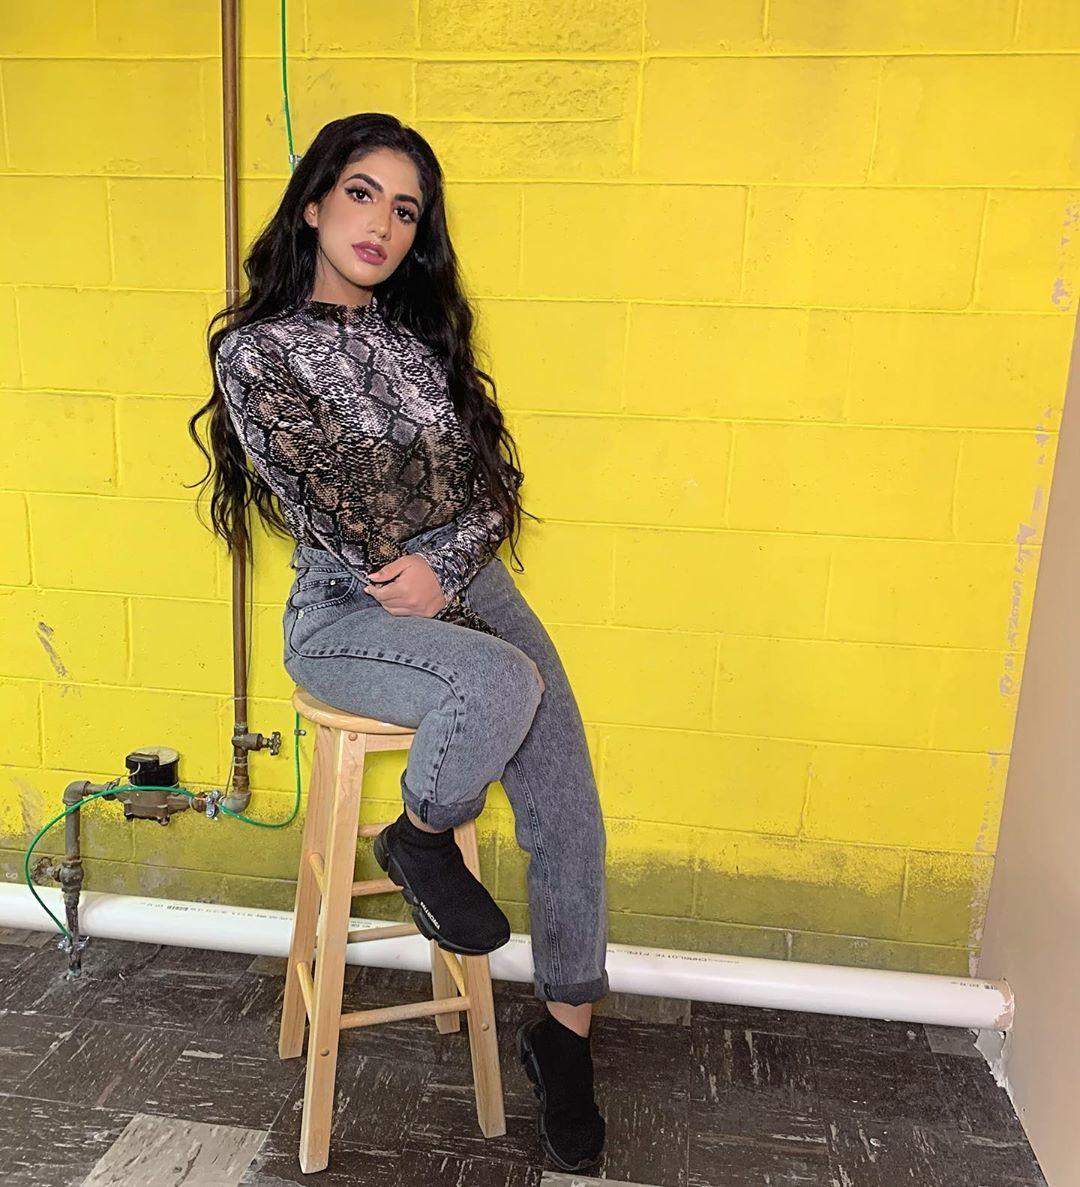 نور ستارز Noor Stars On Instagram What If I Told You That I Love You اشتقتلكم صارلي اسبوع مريضة كتير بعد عملية Clothes Fashion Leather Pants